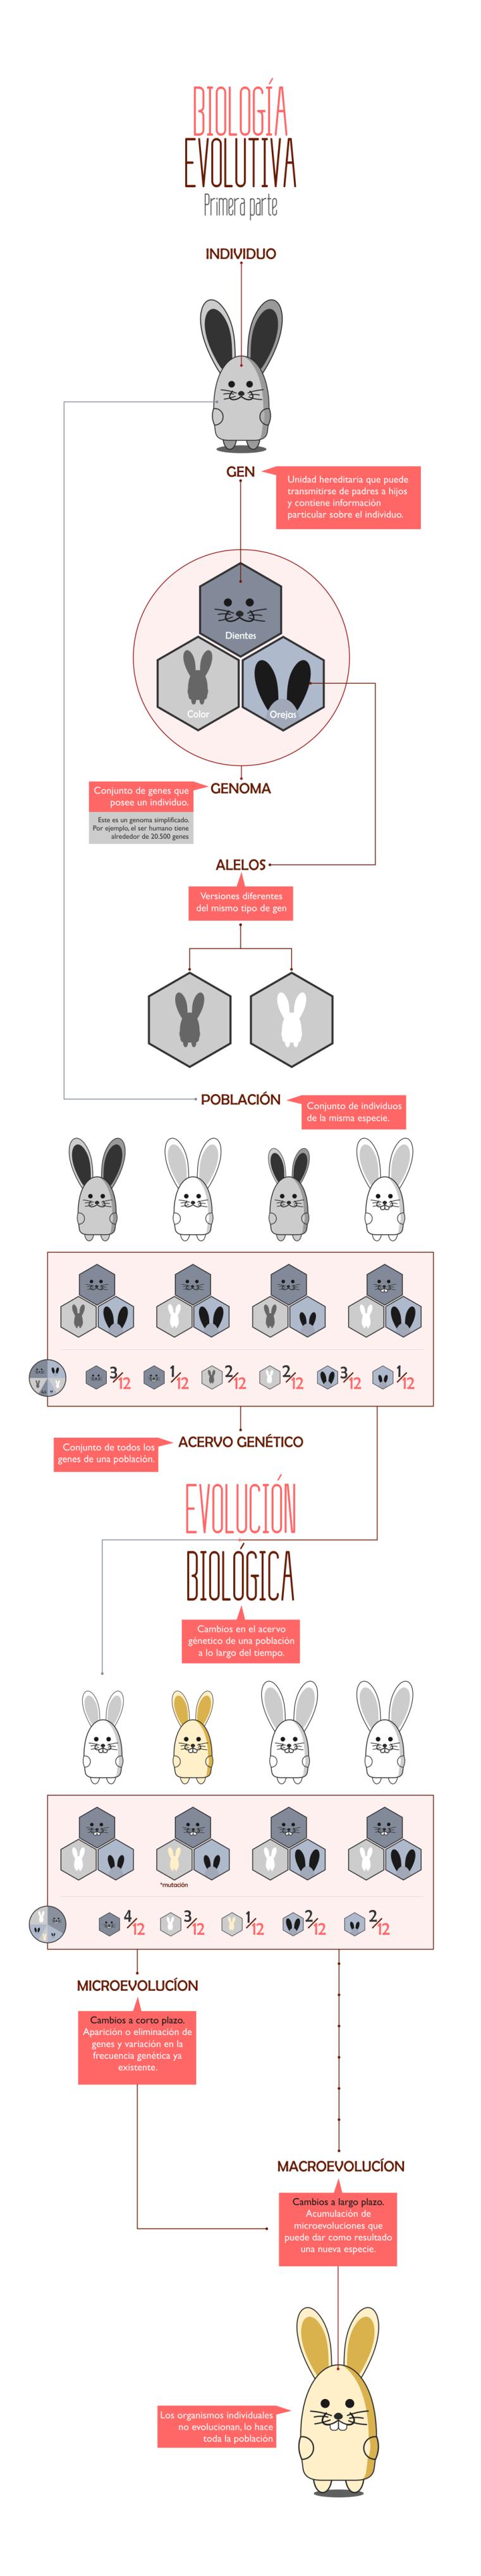 infografía_evolucion_biologica